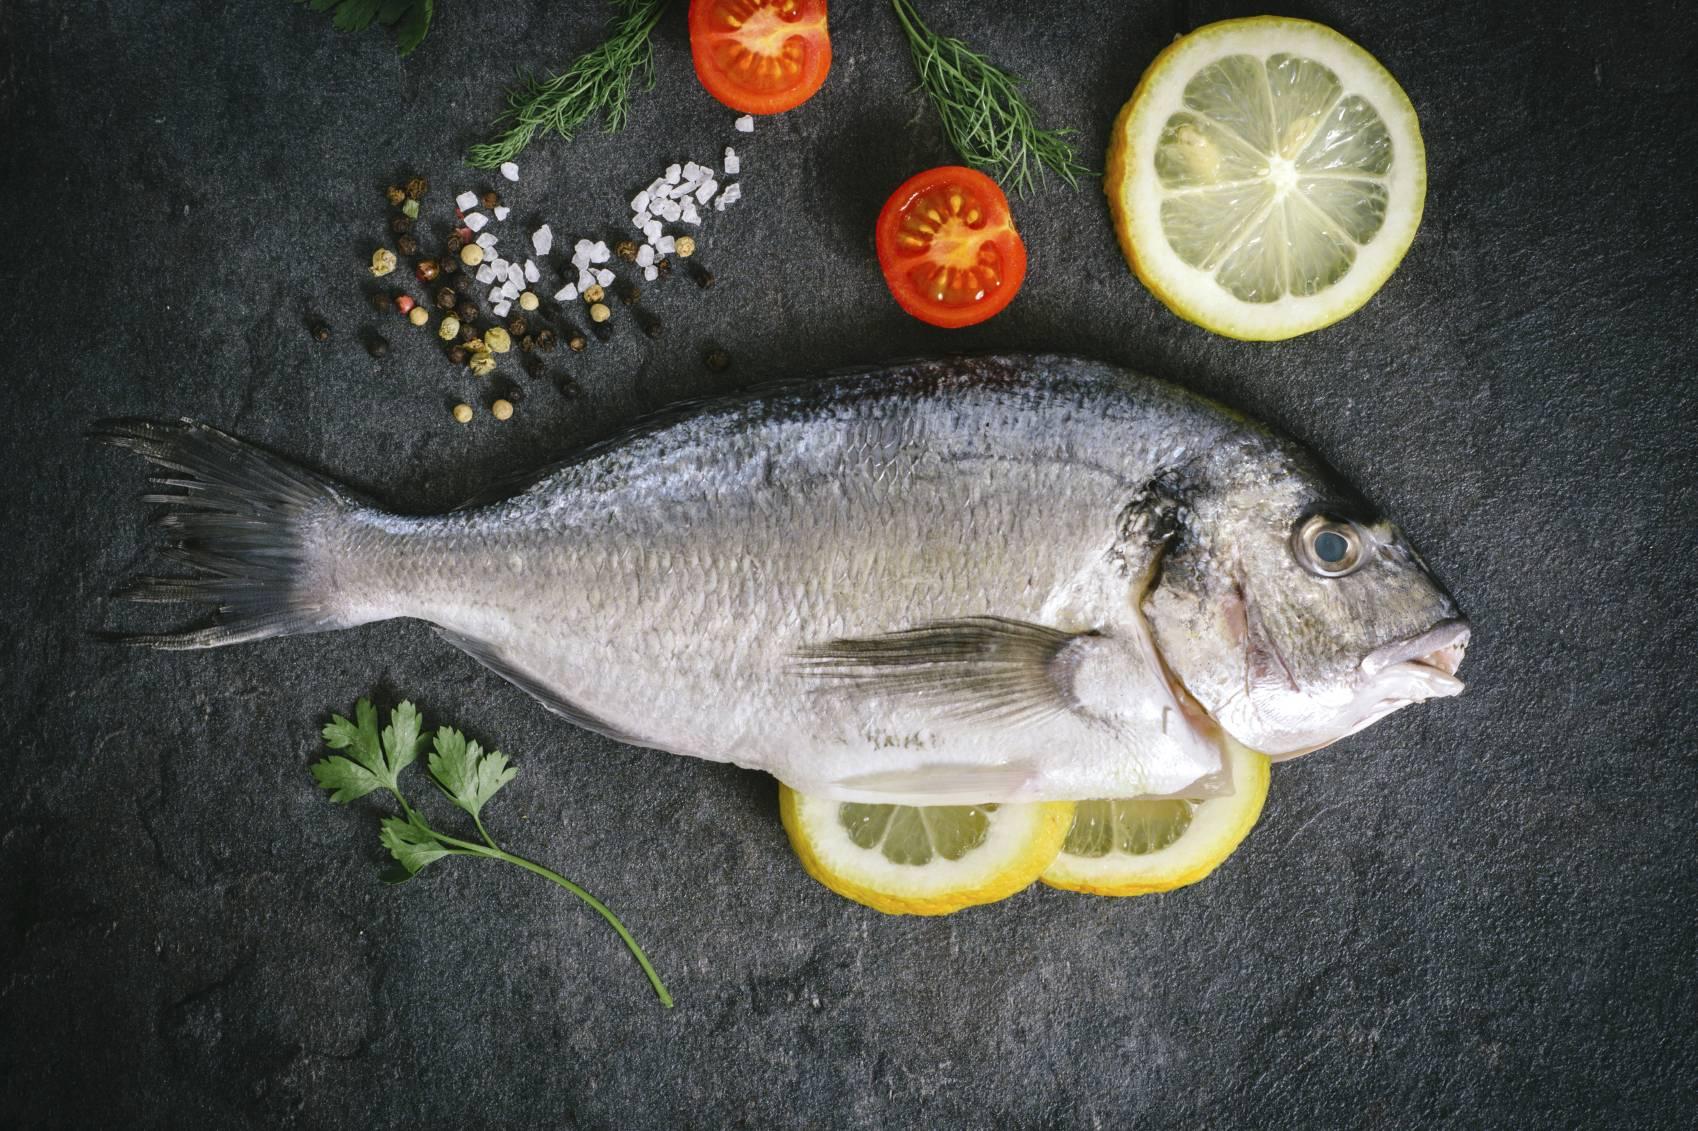 Idees recues sur poisson for Faux poisson rouge